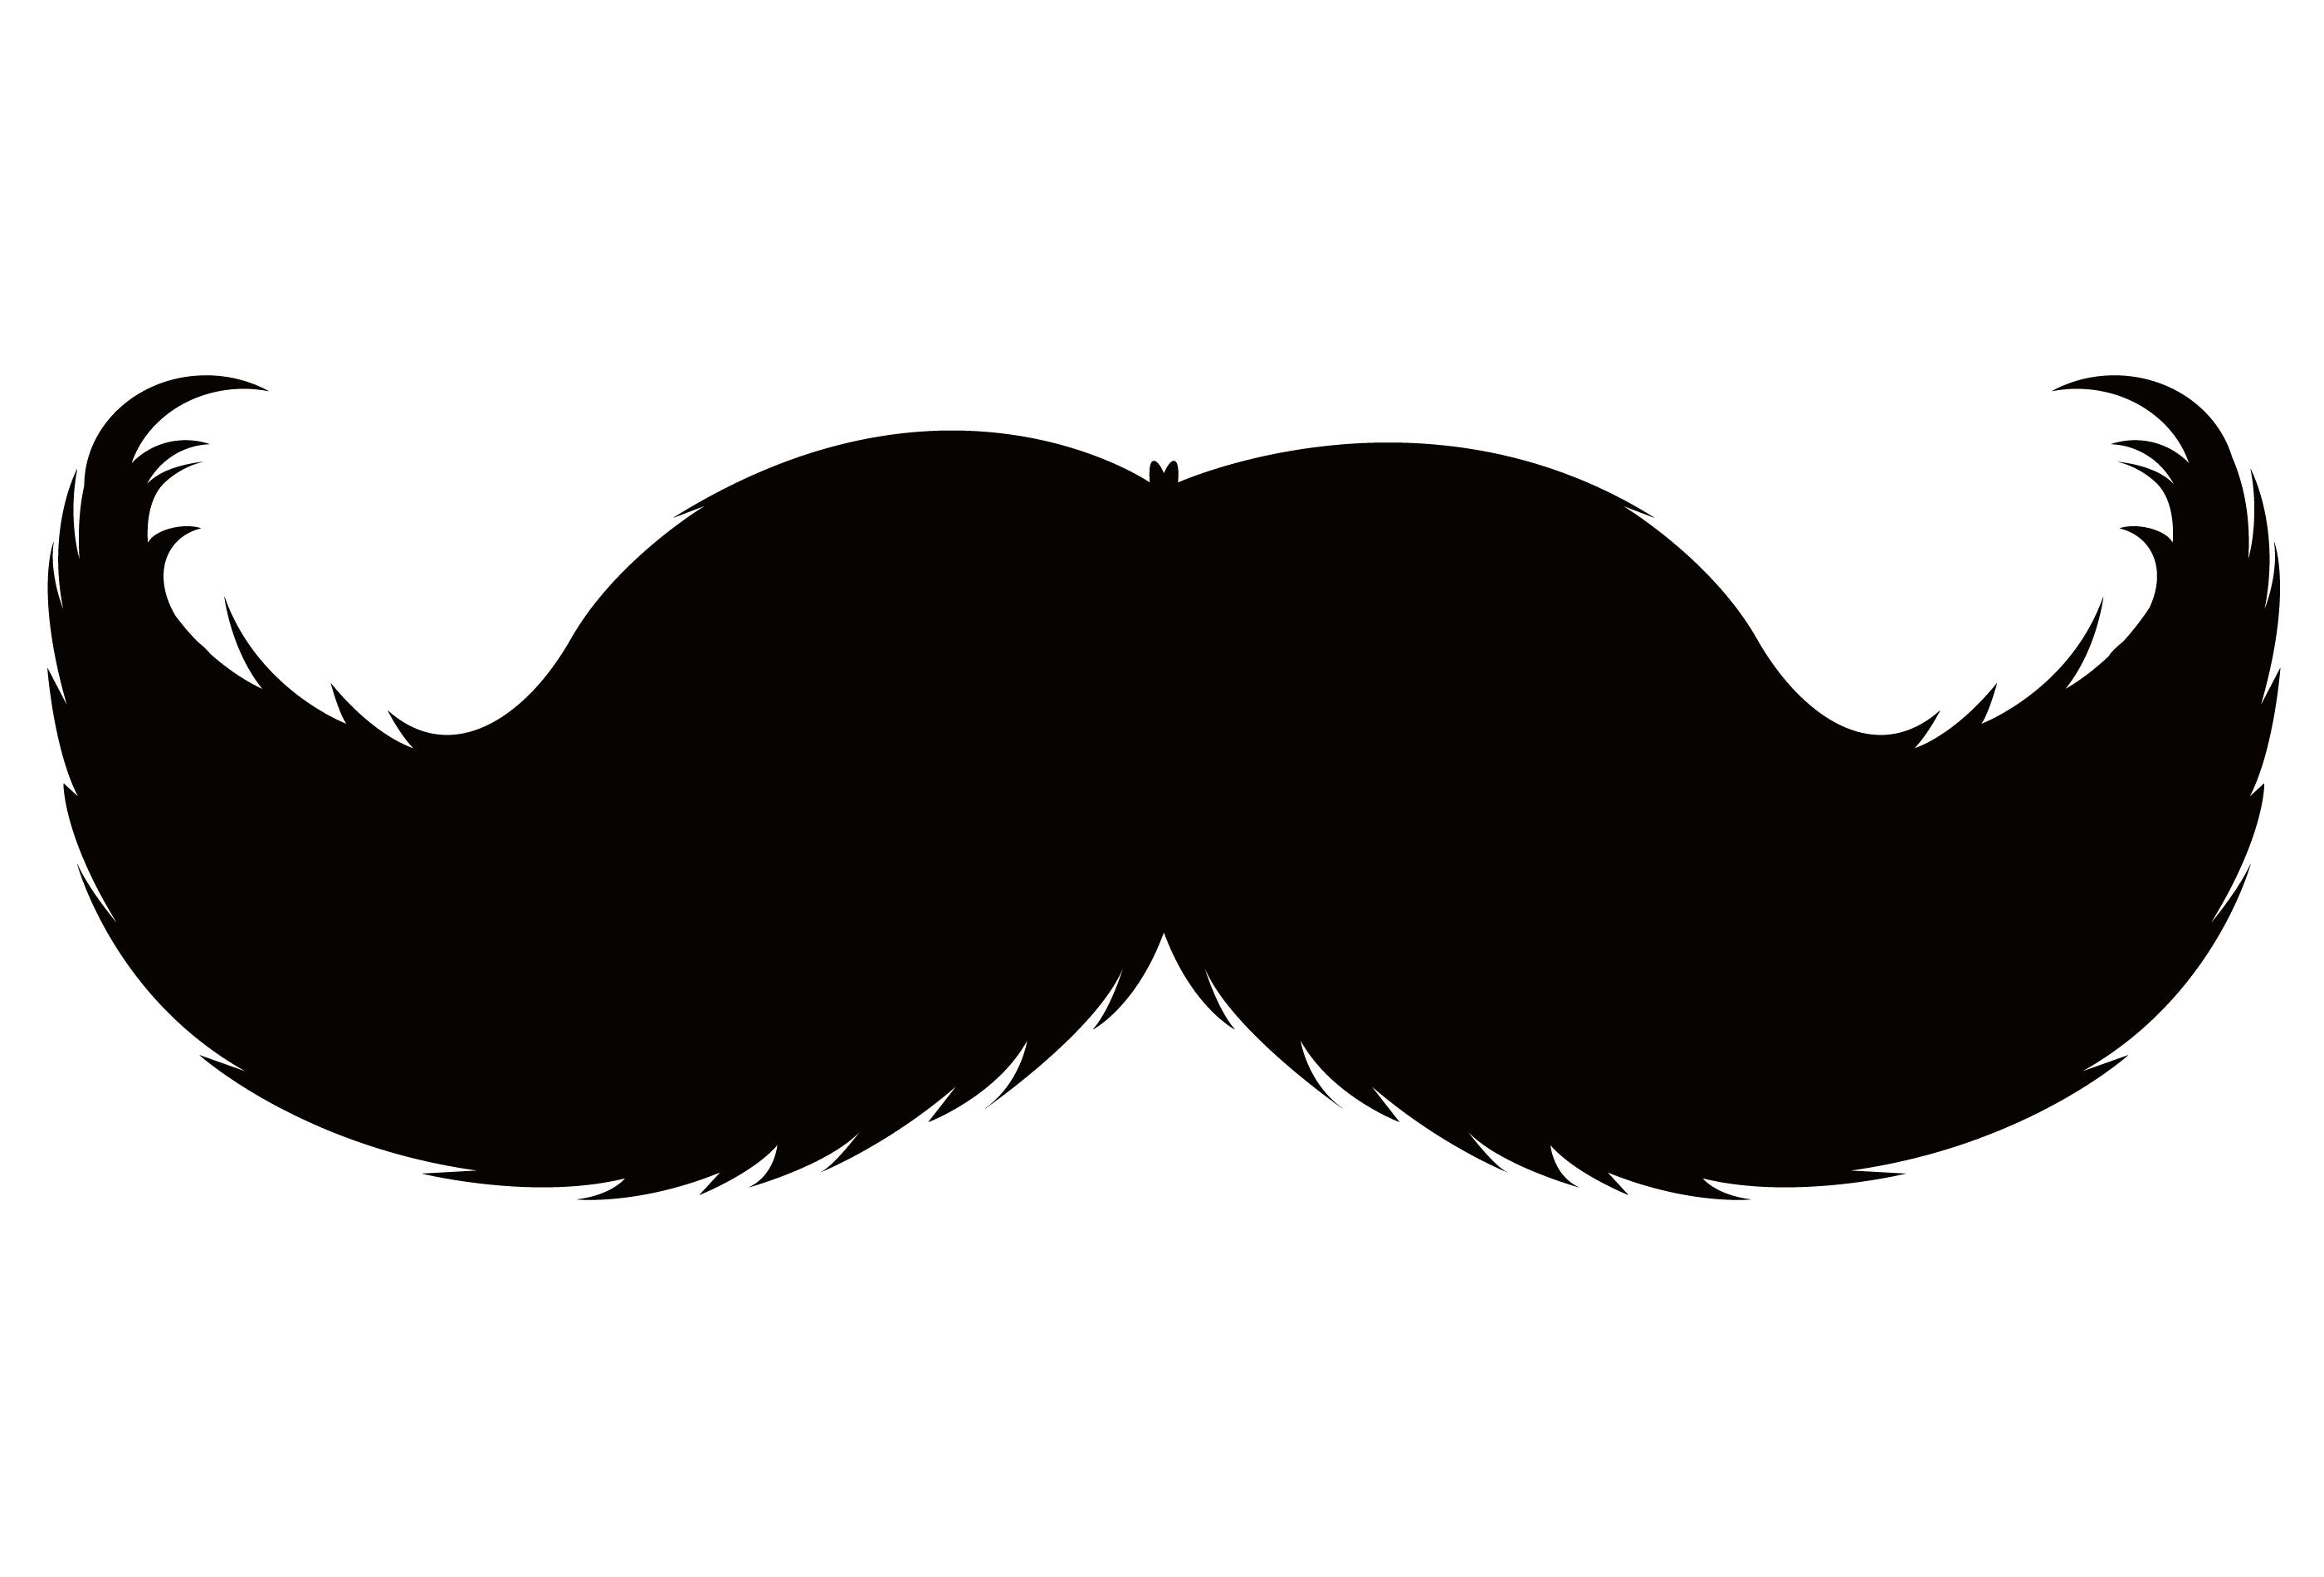 clipart royalty free download Moustache PNG Transparent Images